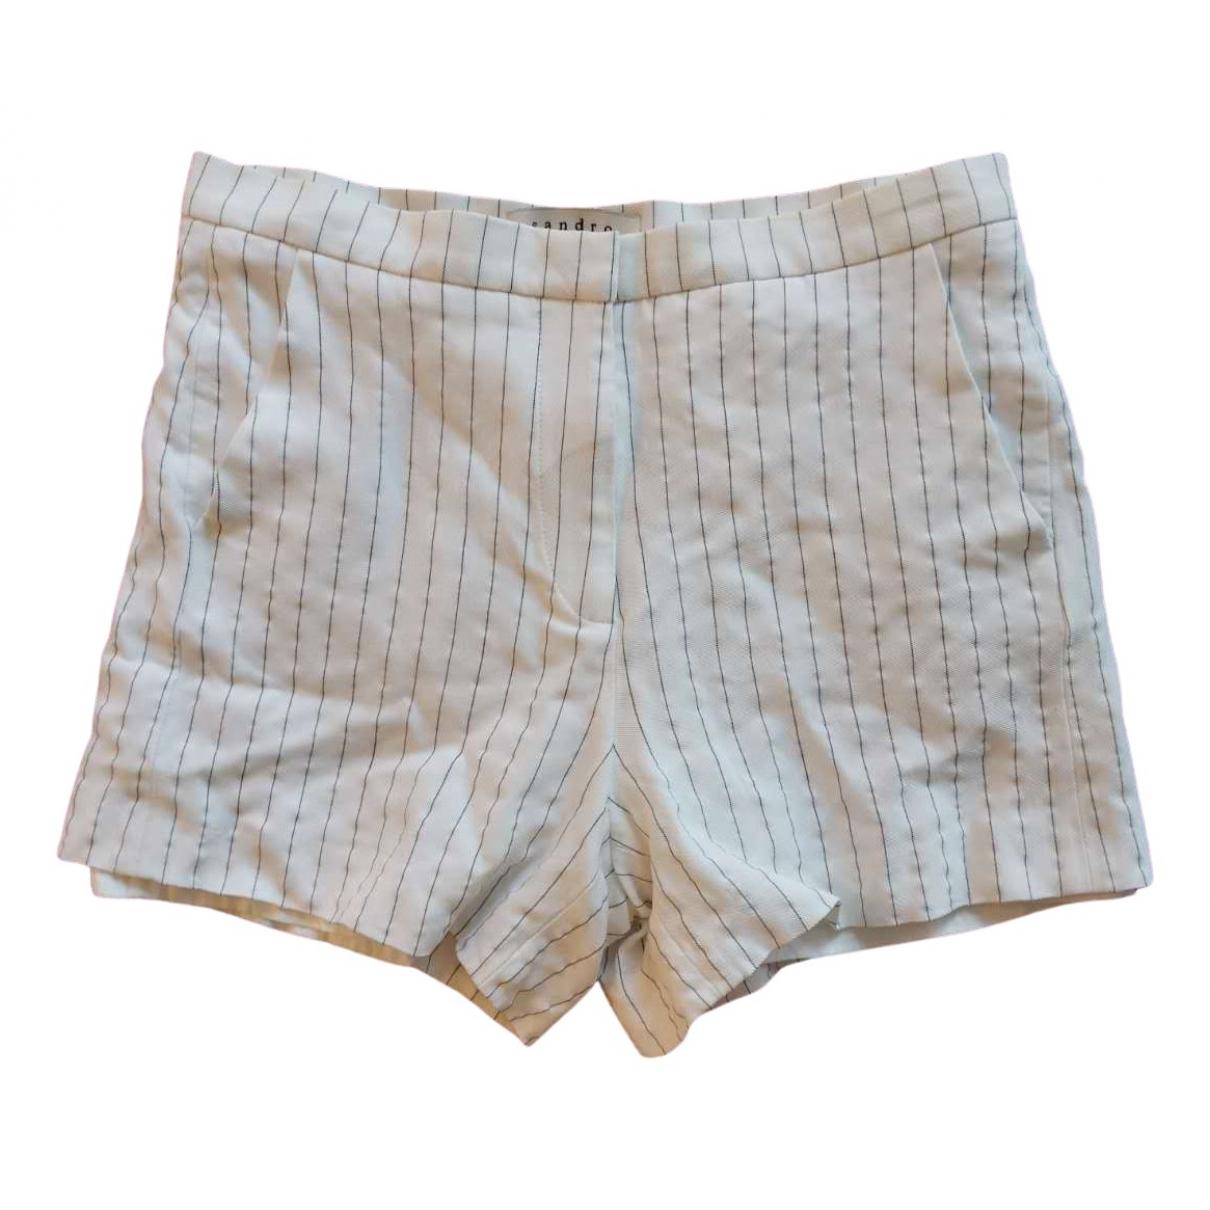 Sandro \N Shorts in  Weiss Viskose